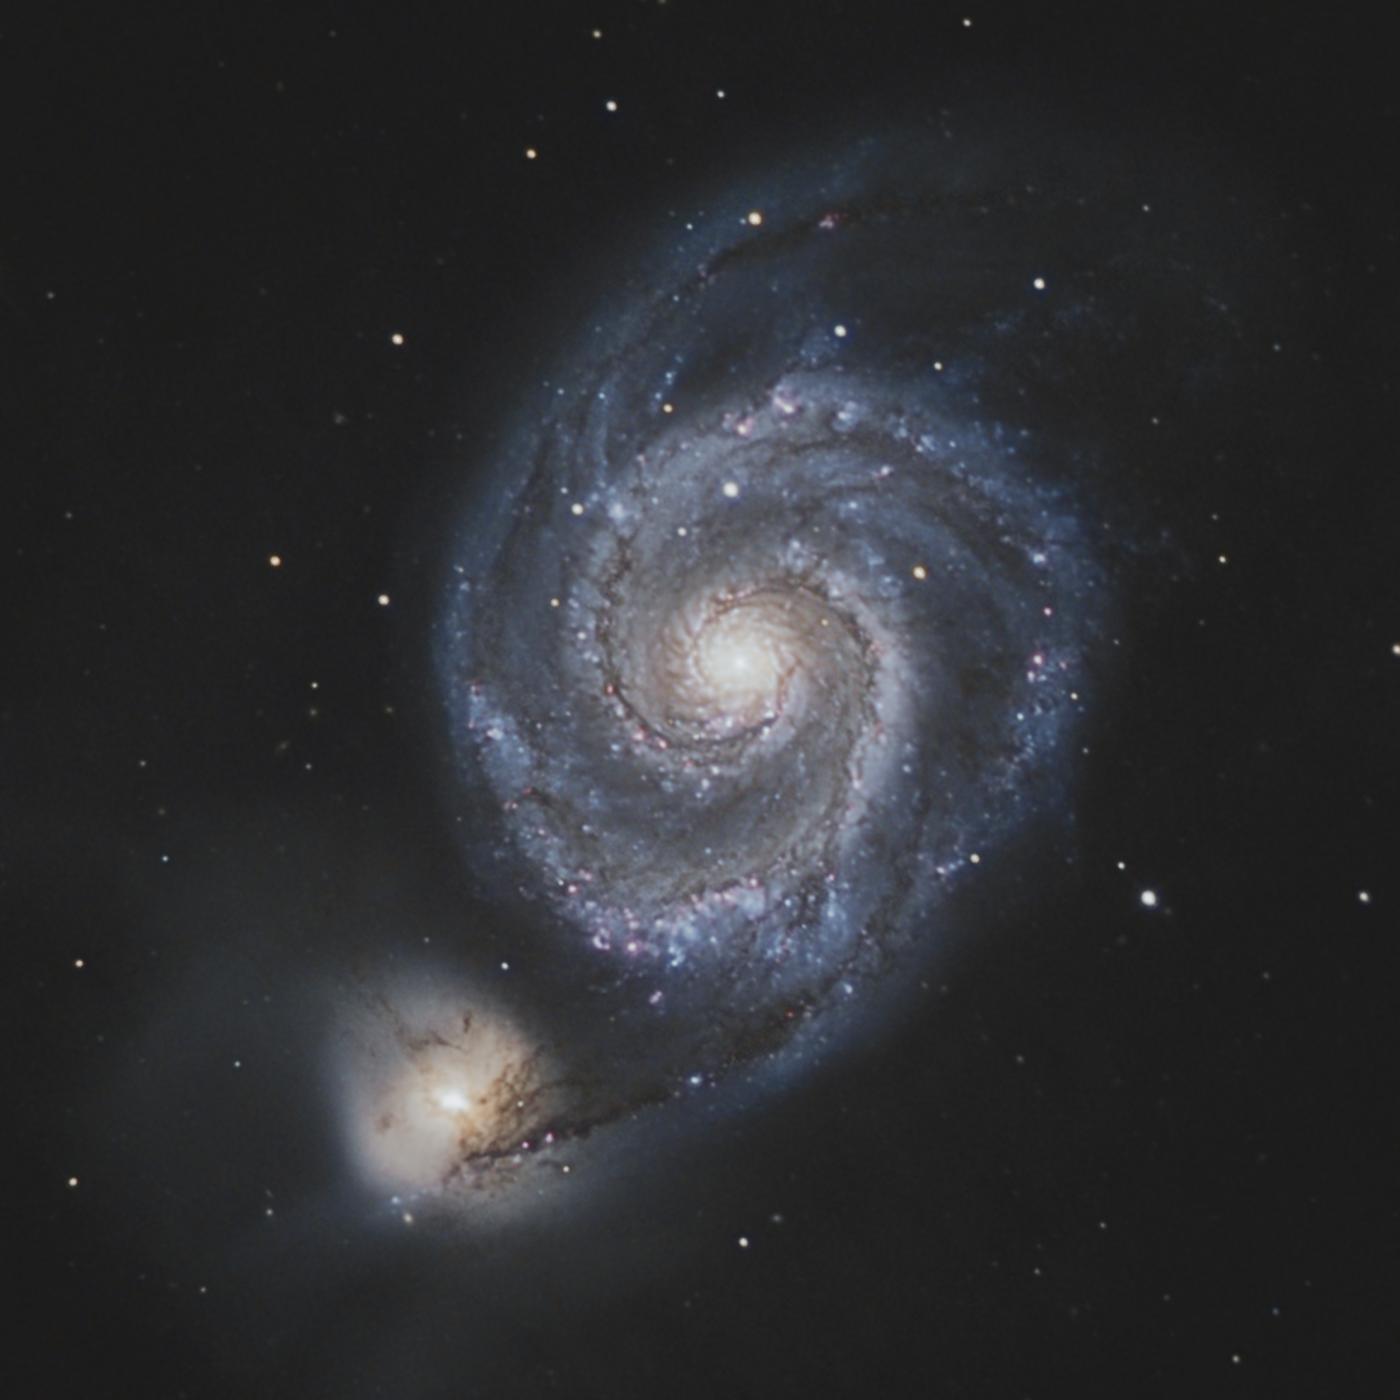 Deep Sky Planetary Technique (by Shaihulud) C3YlTkmqGUft_16536x16536_wmhqkGbg